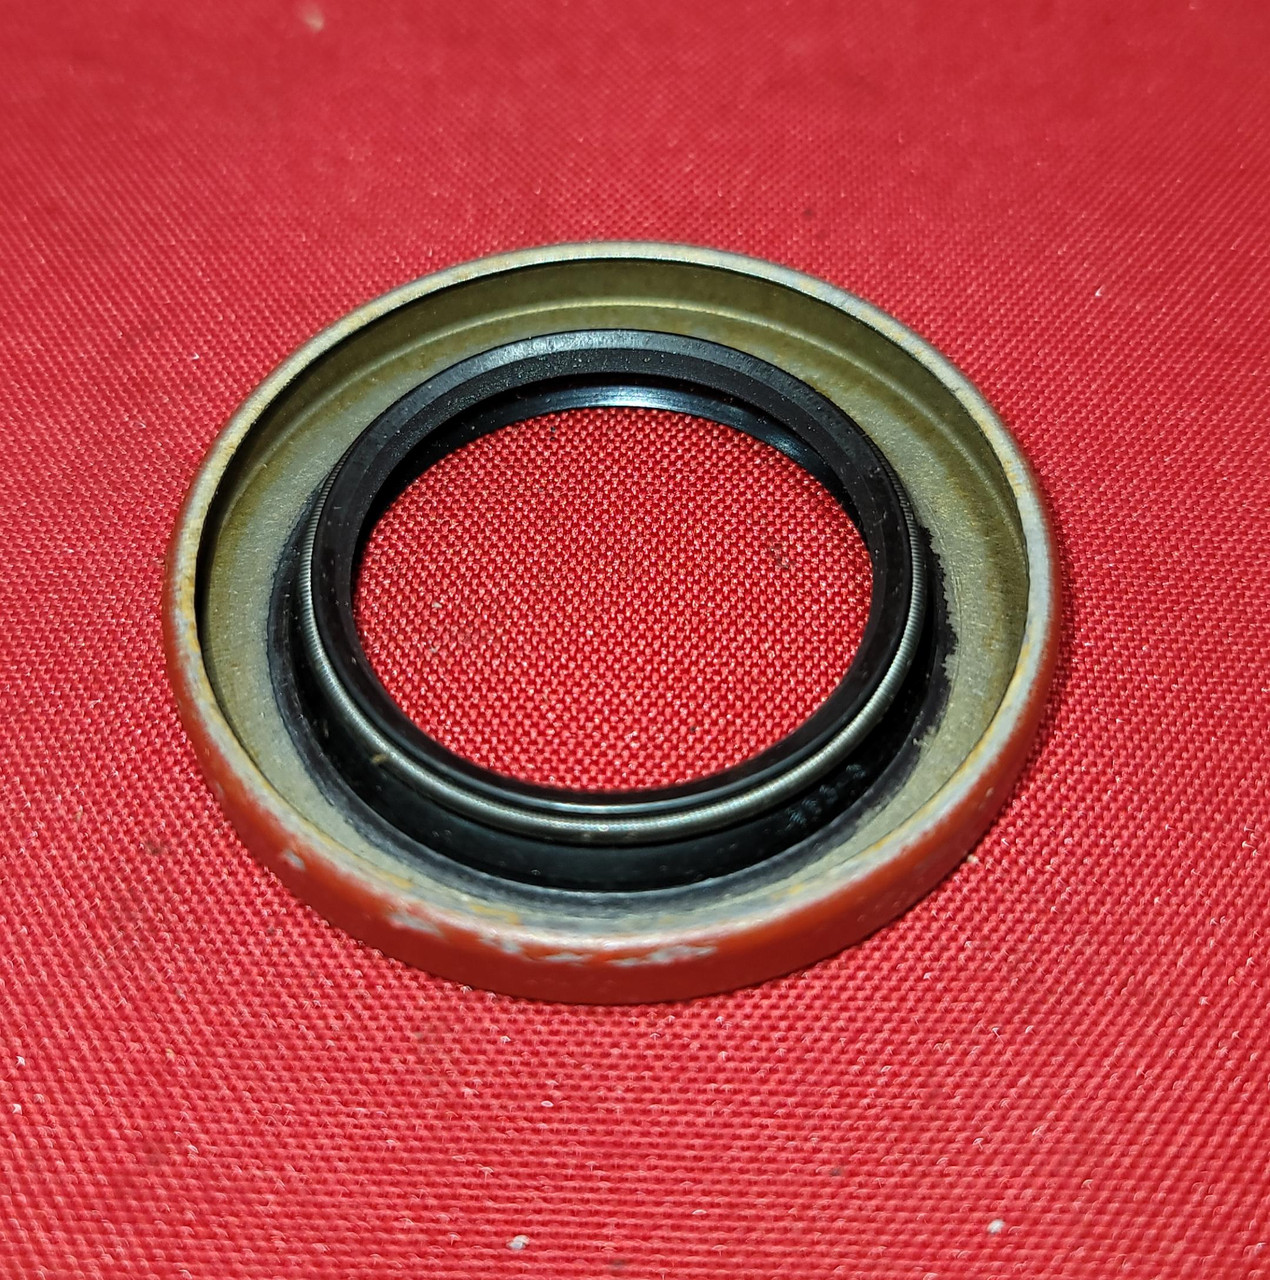 Federal Mogul 471750 Oil Seal